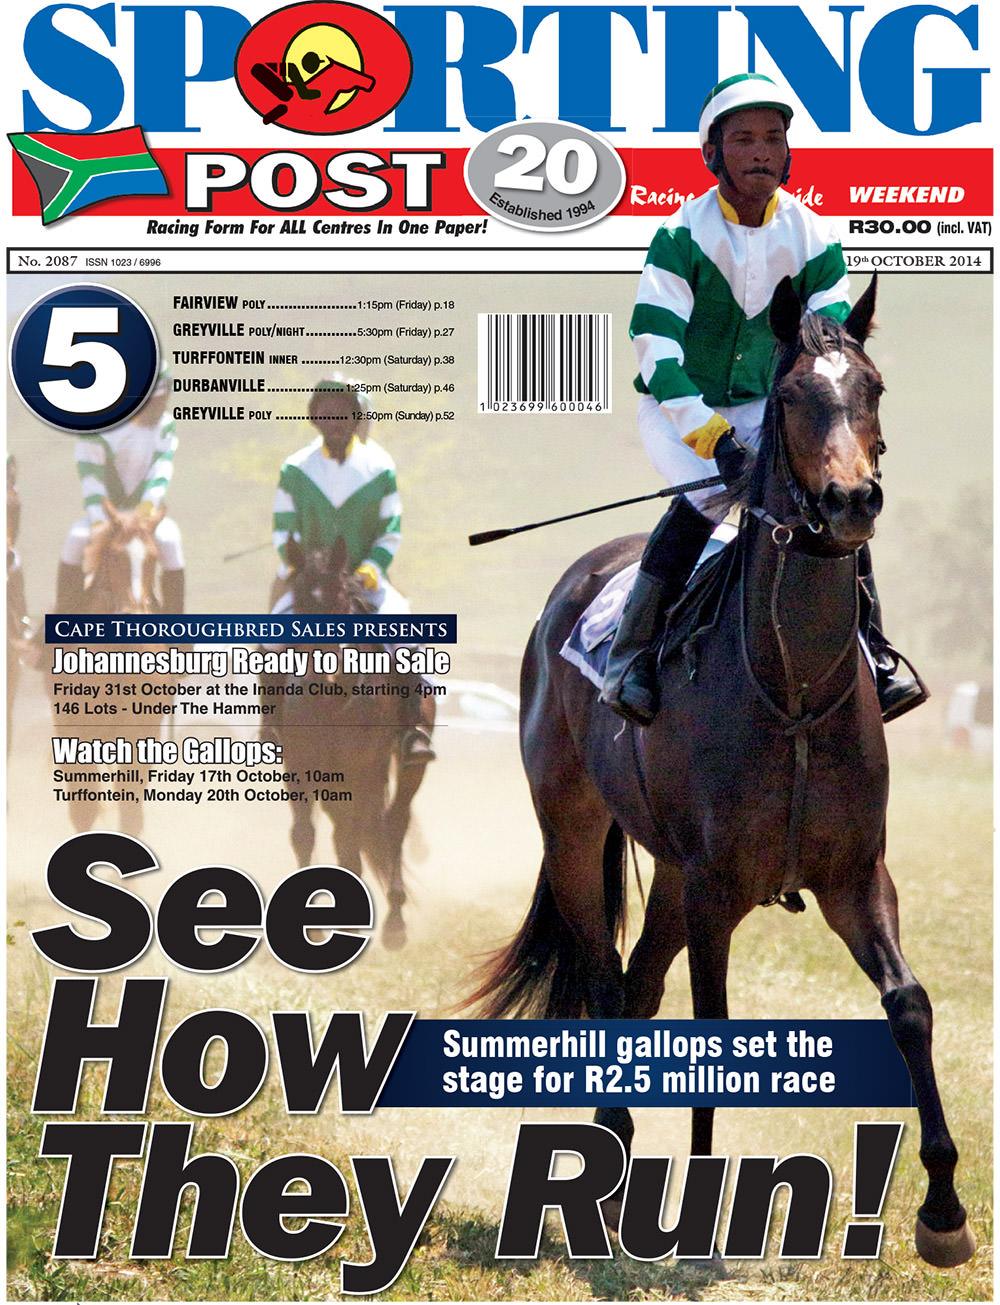 Sporting Post - Johannesburg Ready To Run Sale 2014